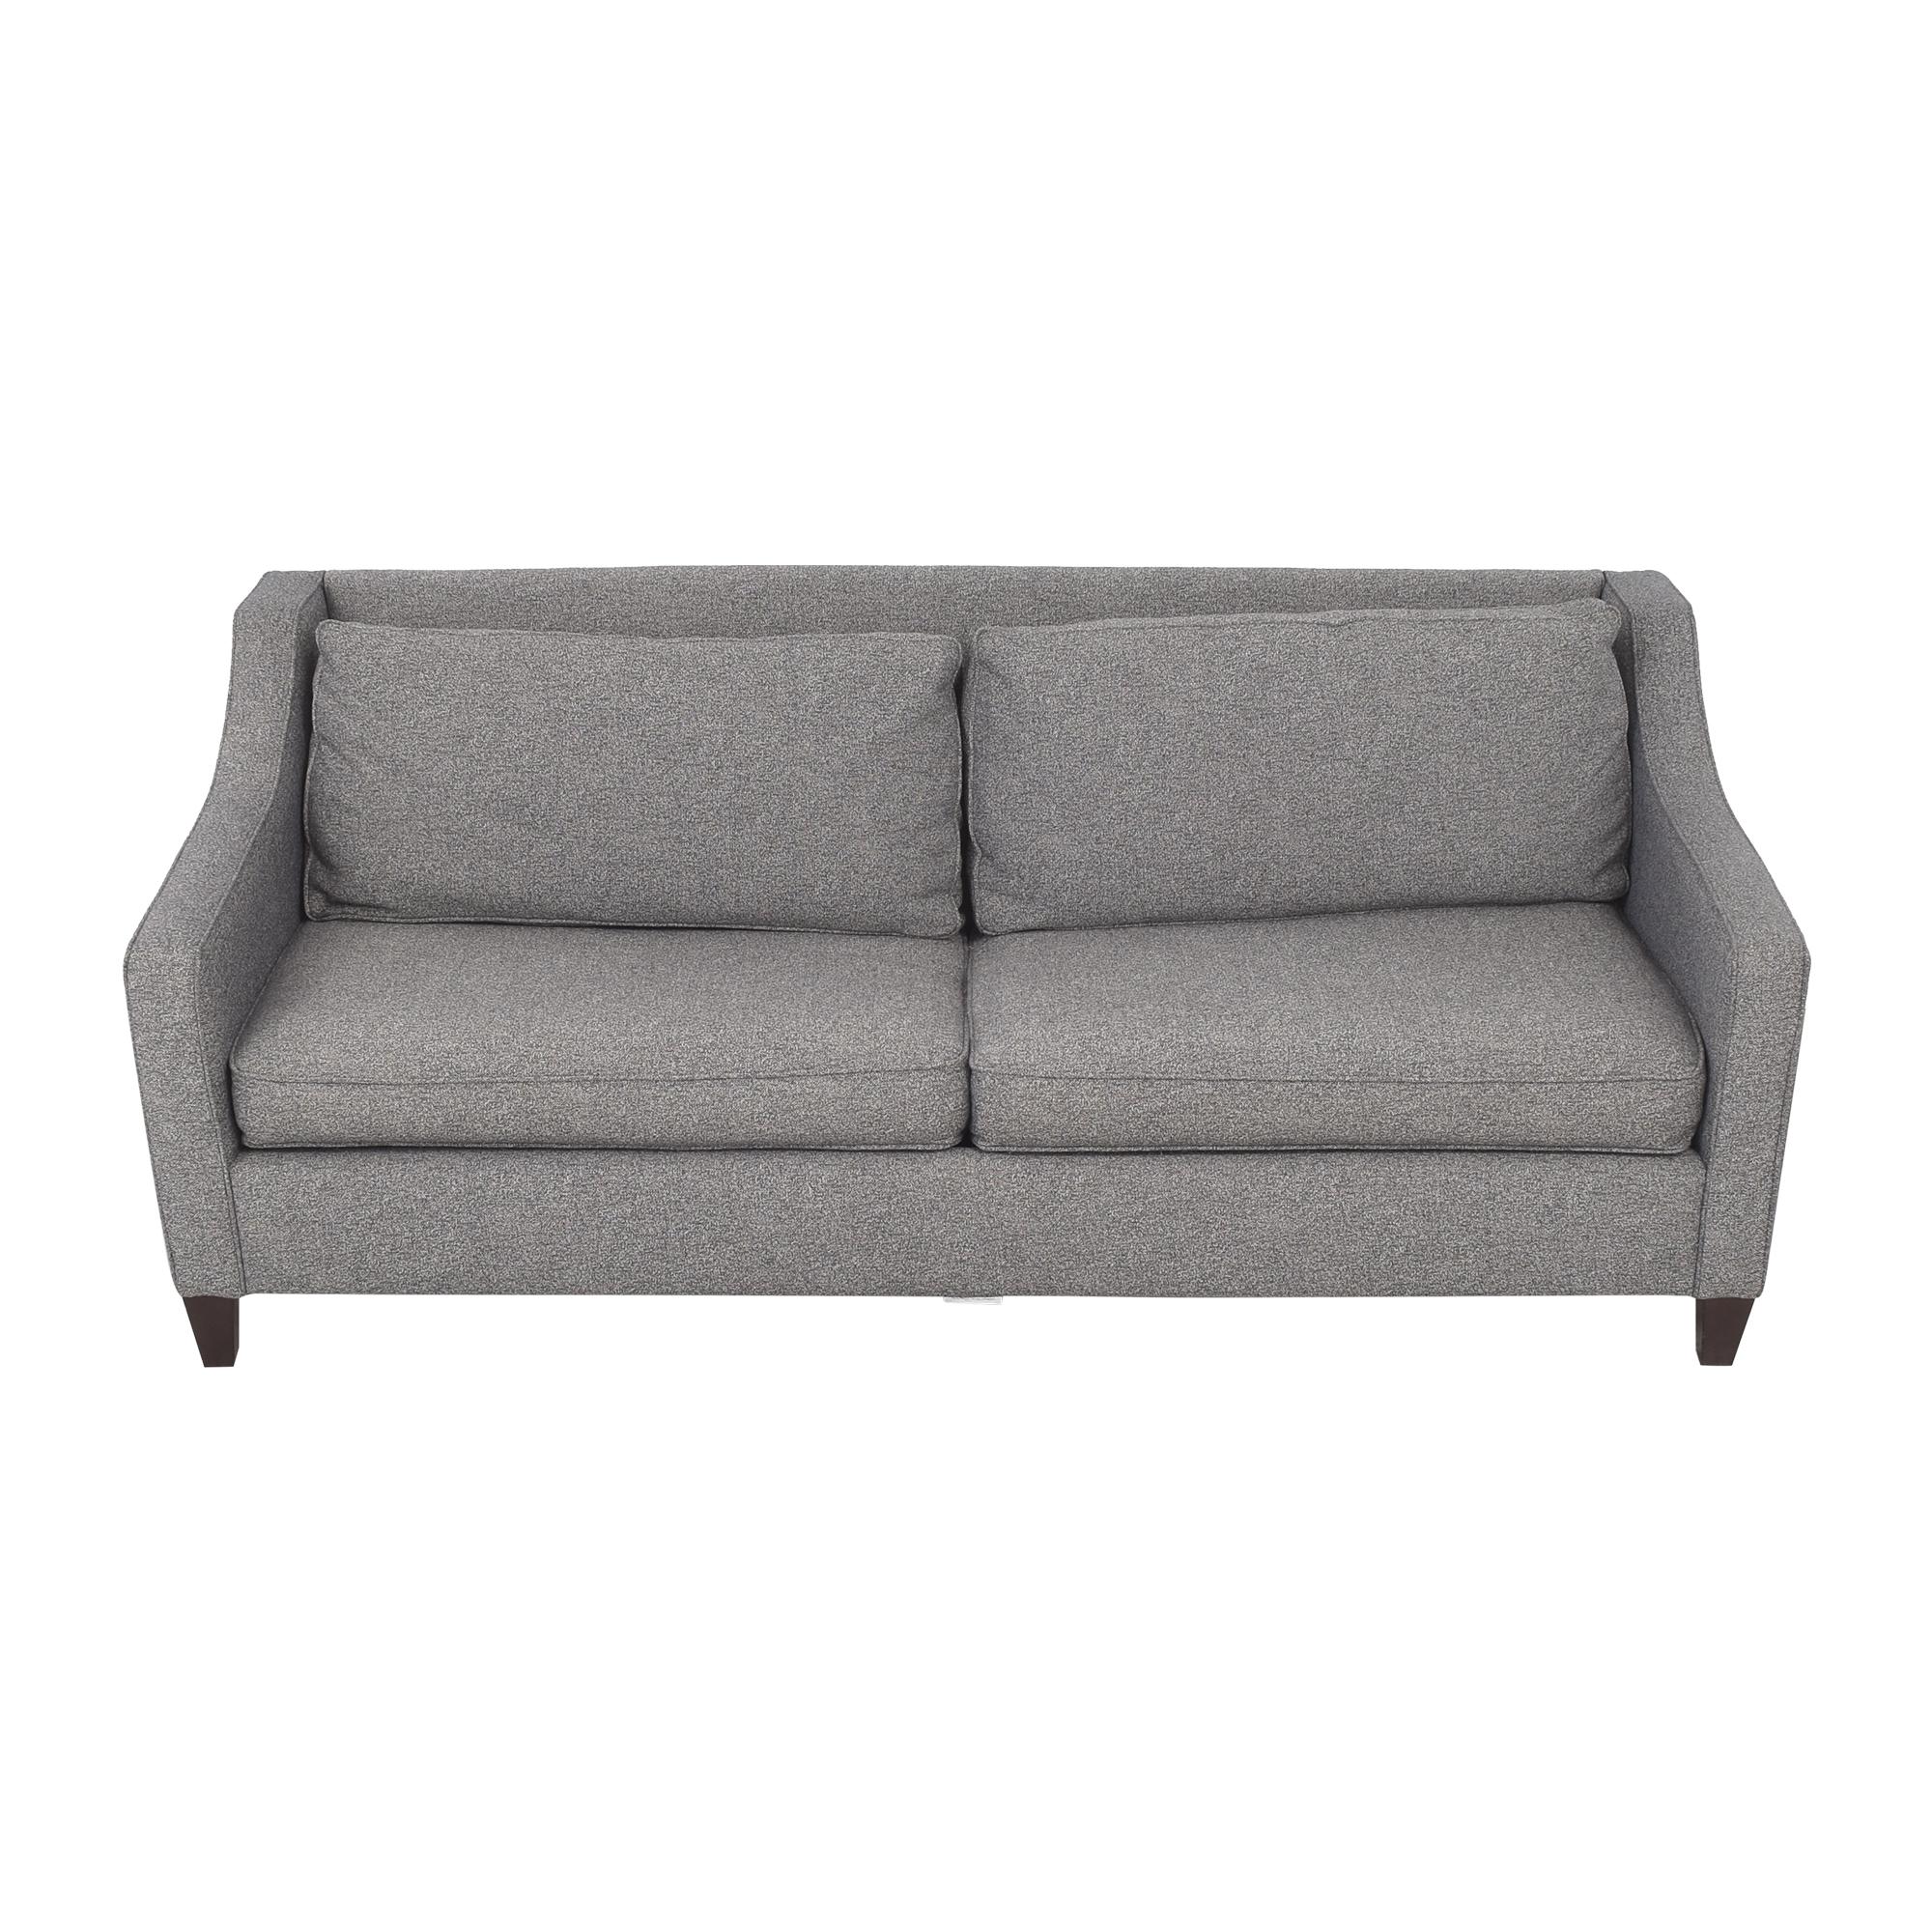 West Elm West Elm Paidge Sleeper Sofa dimensions